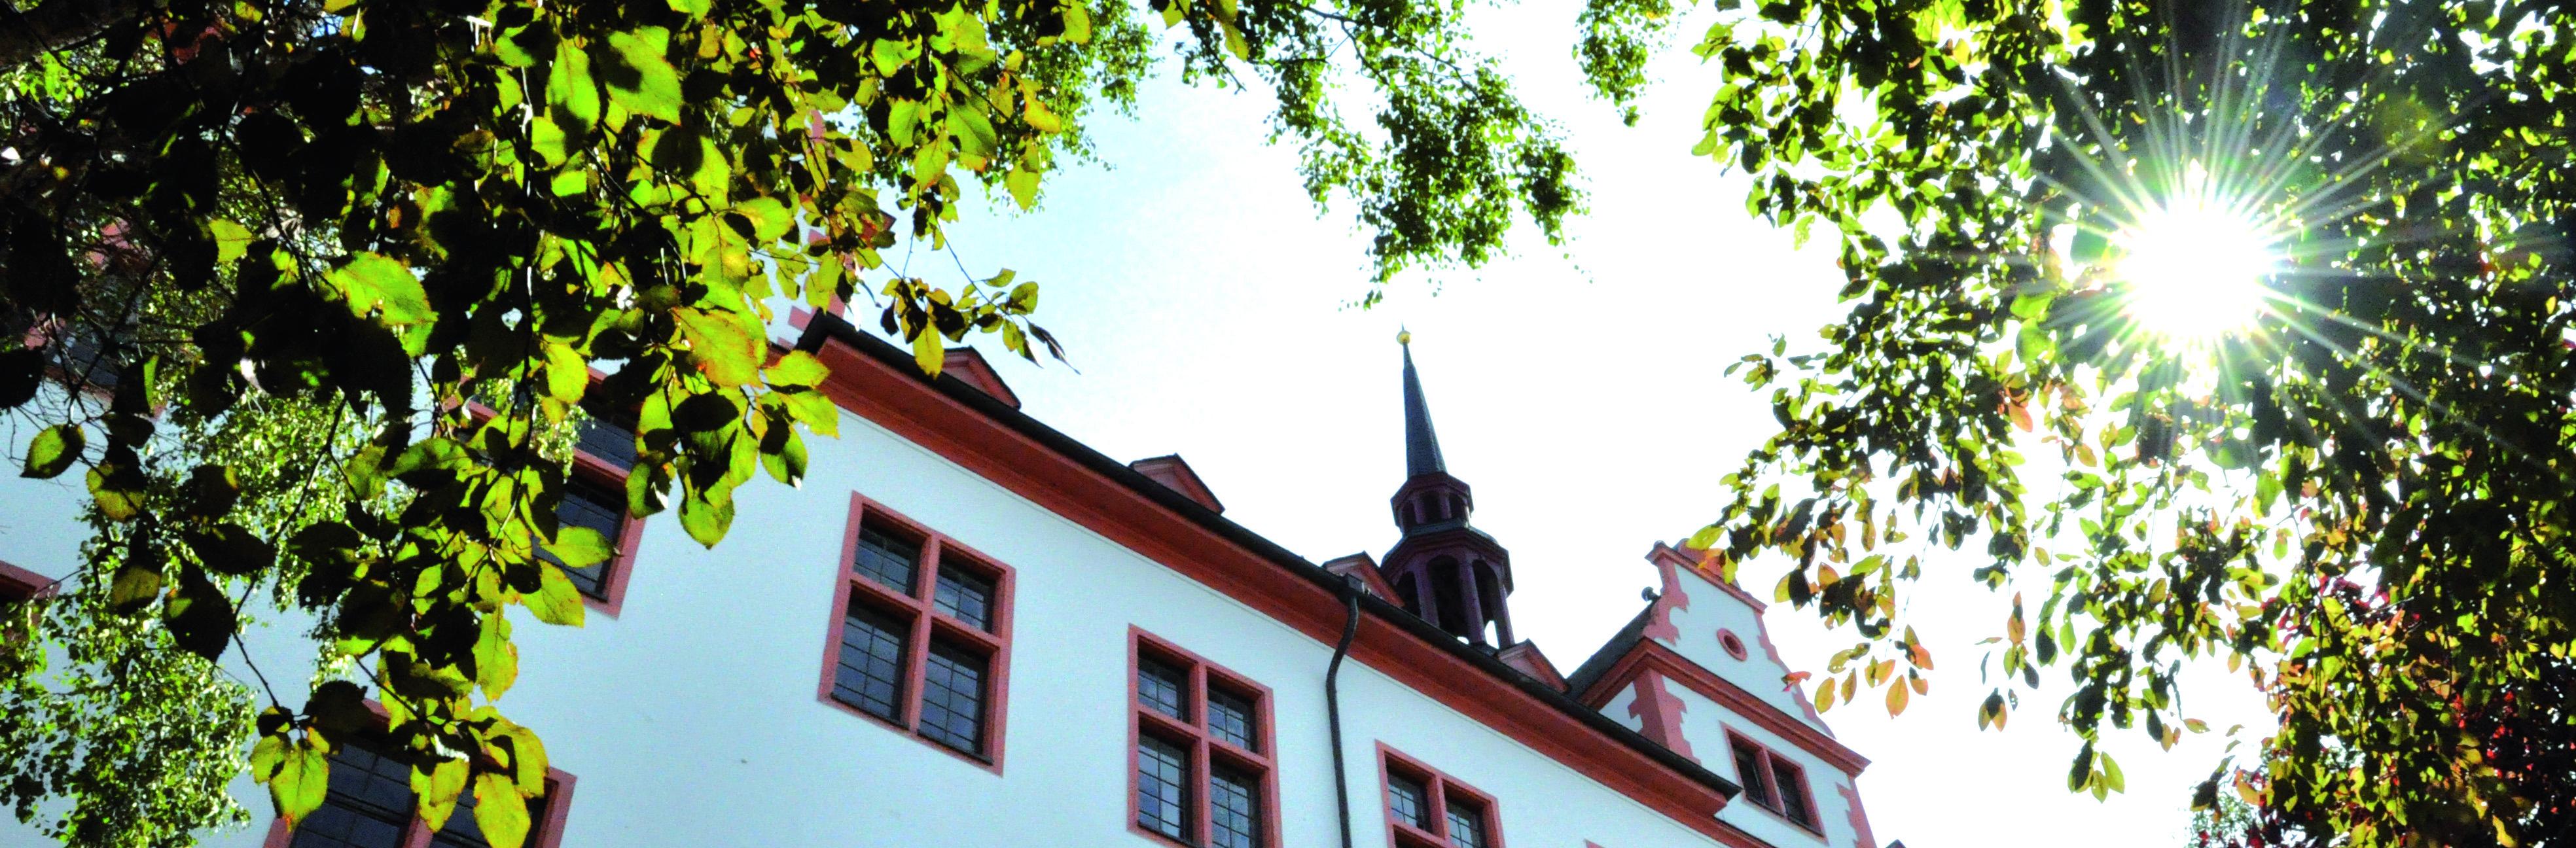 IEG - Leibniz Institute of European History